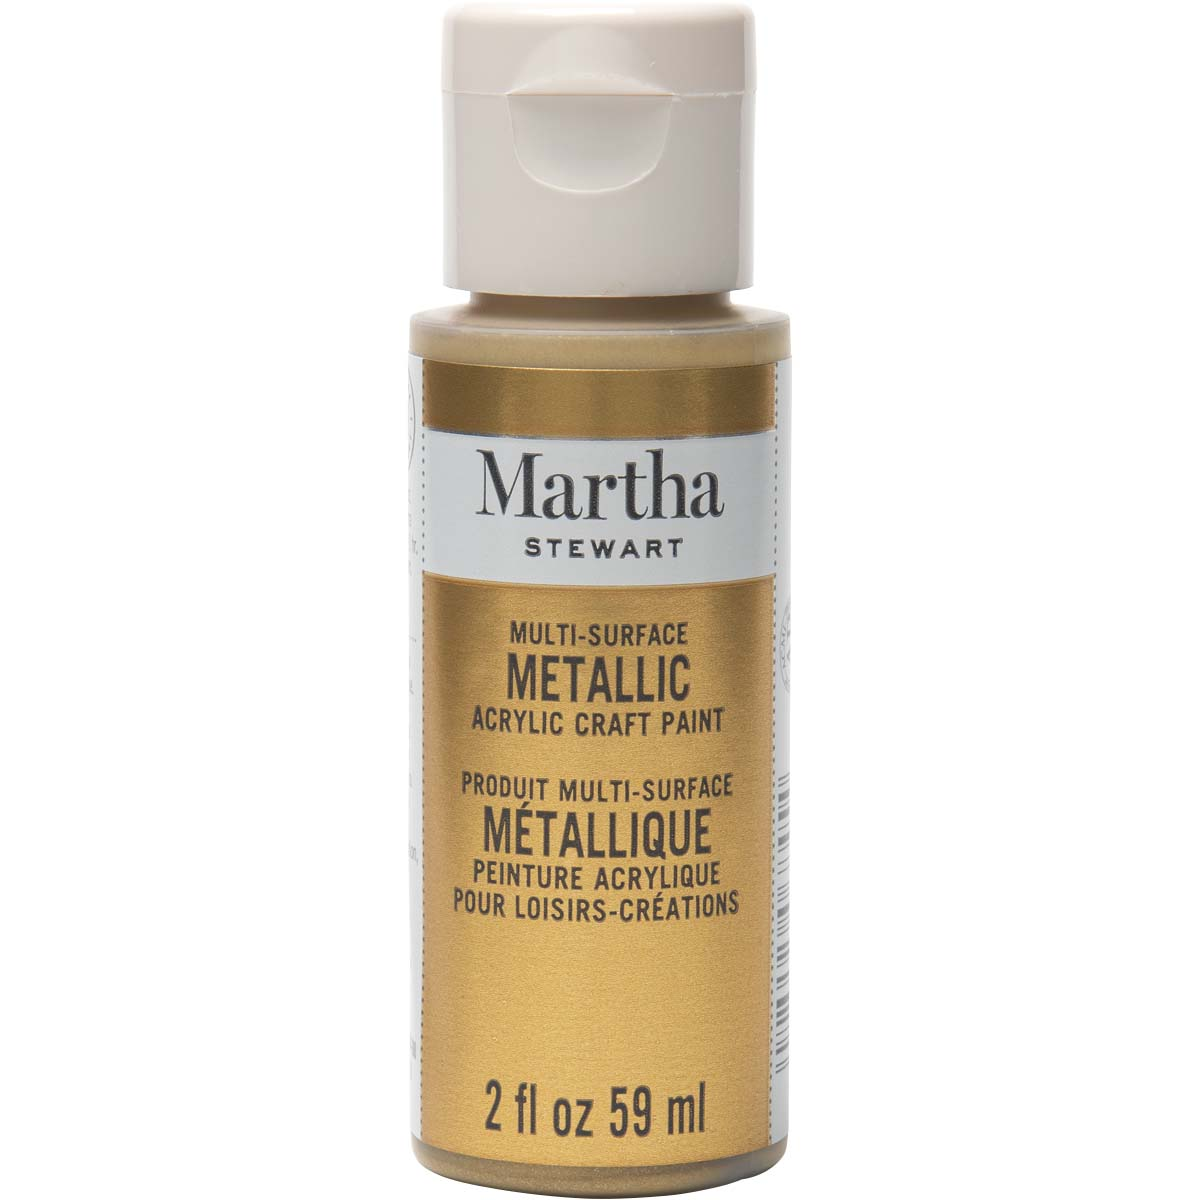 Martha Stewart ® Multi-Surface Metallic Acrylic Craft Paint - Gold, 2 oz. - 32103CA